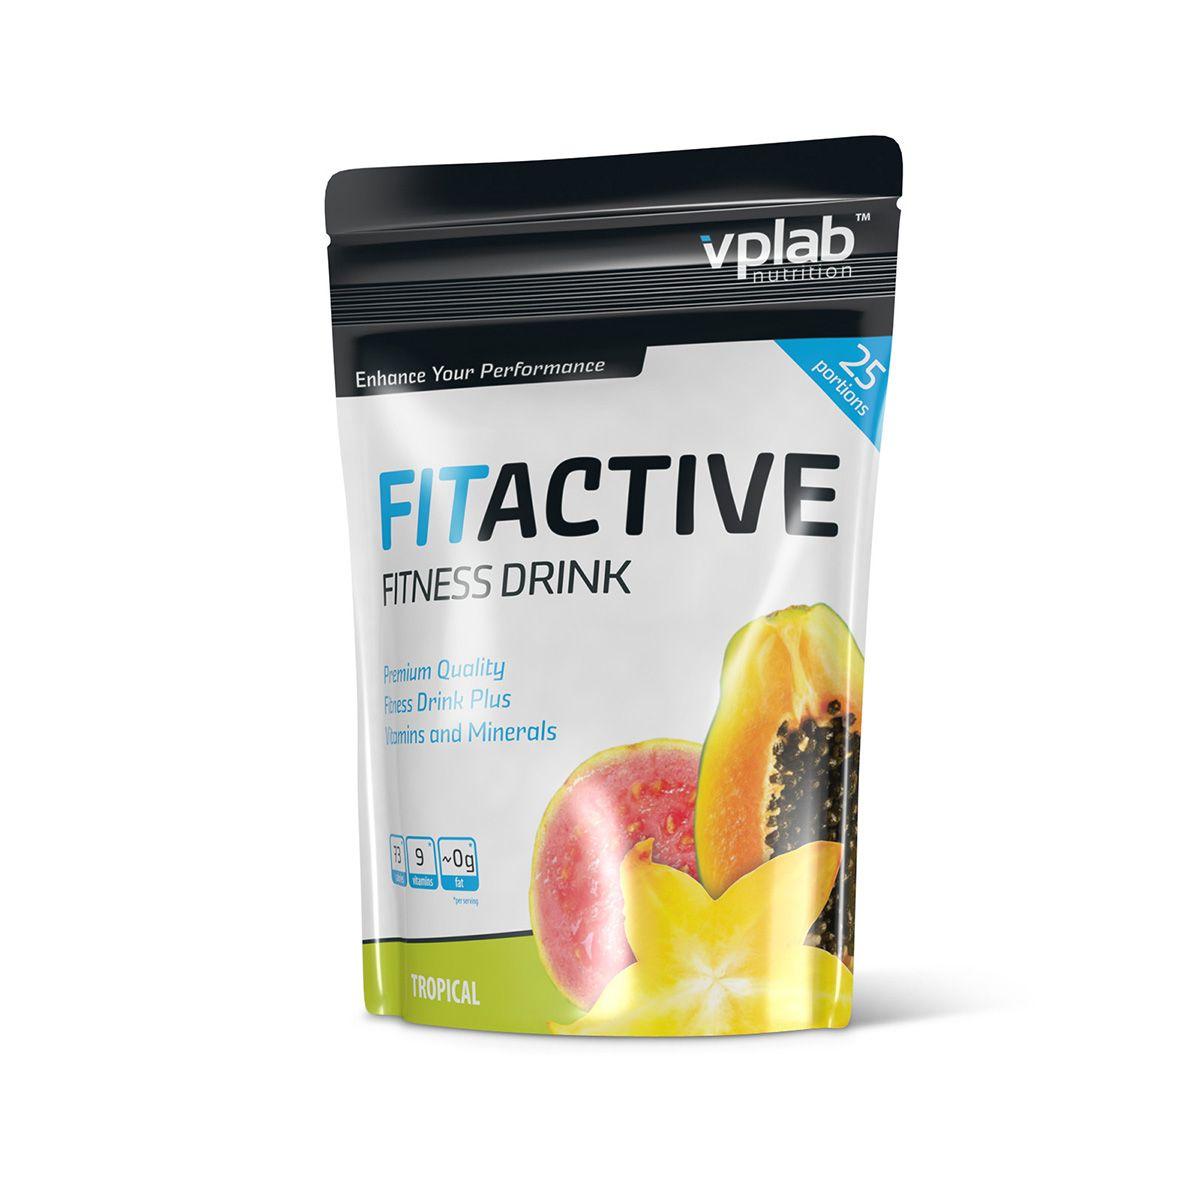 "Изотоник Vplab ""Fitactive Fitness Drink"", тропик, 500 г, VP Laboratory"